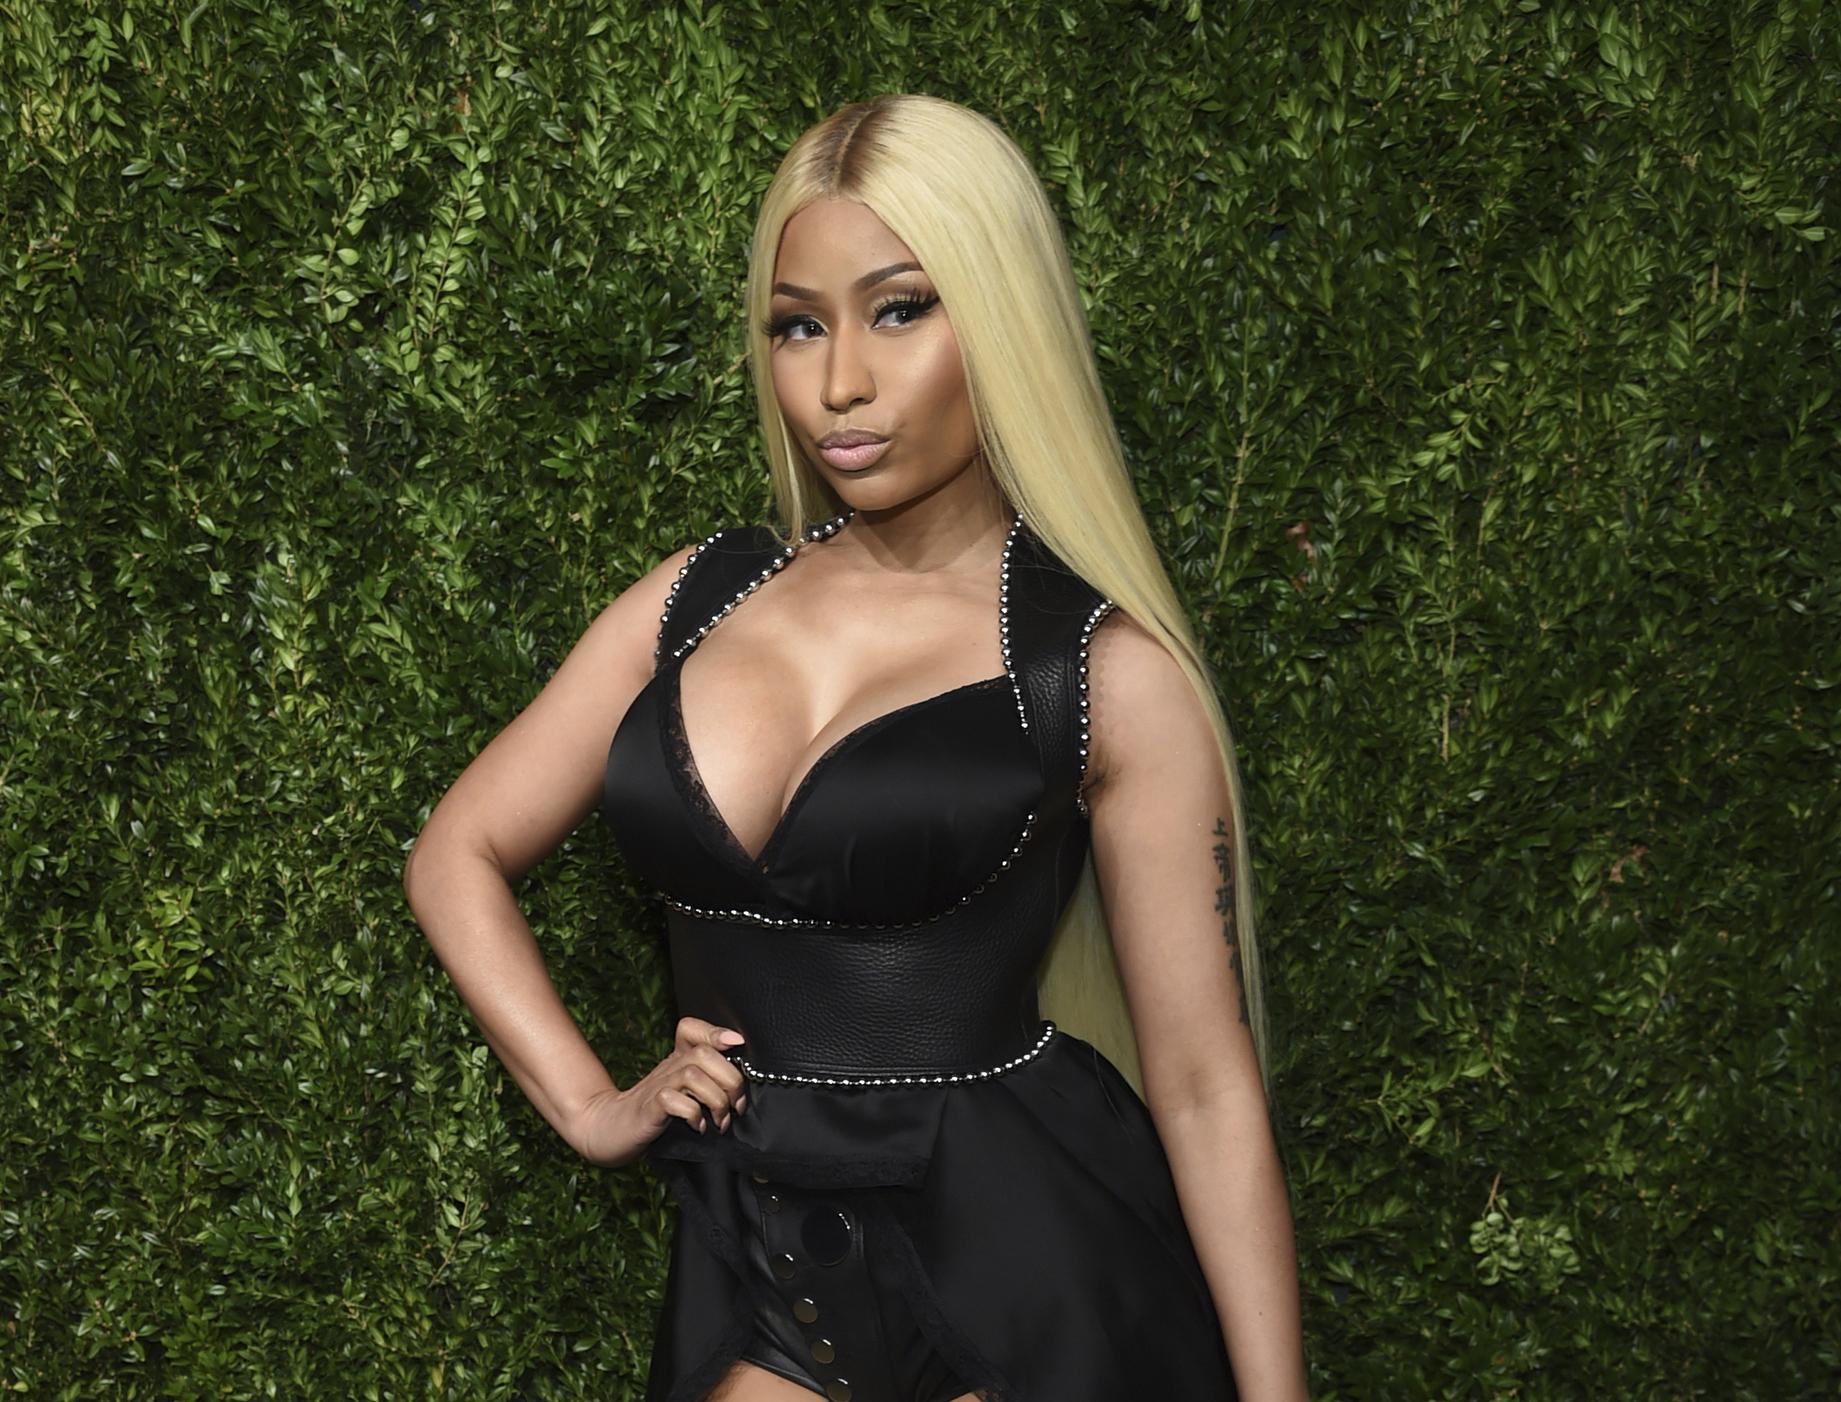 Nicki Minaj 2020 Calendar Buy Nicki Minaj pulls out of Saudi Arabia concert | RochesterFirst